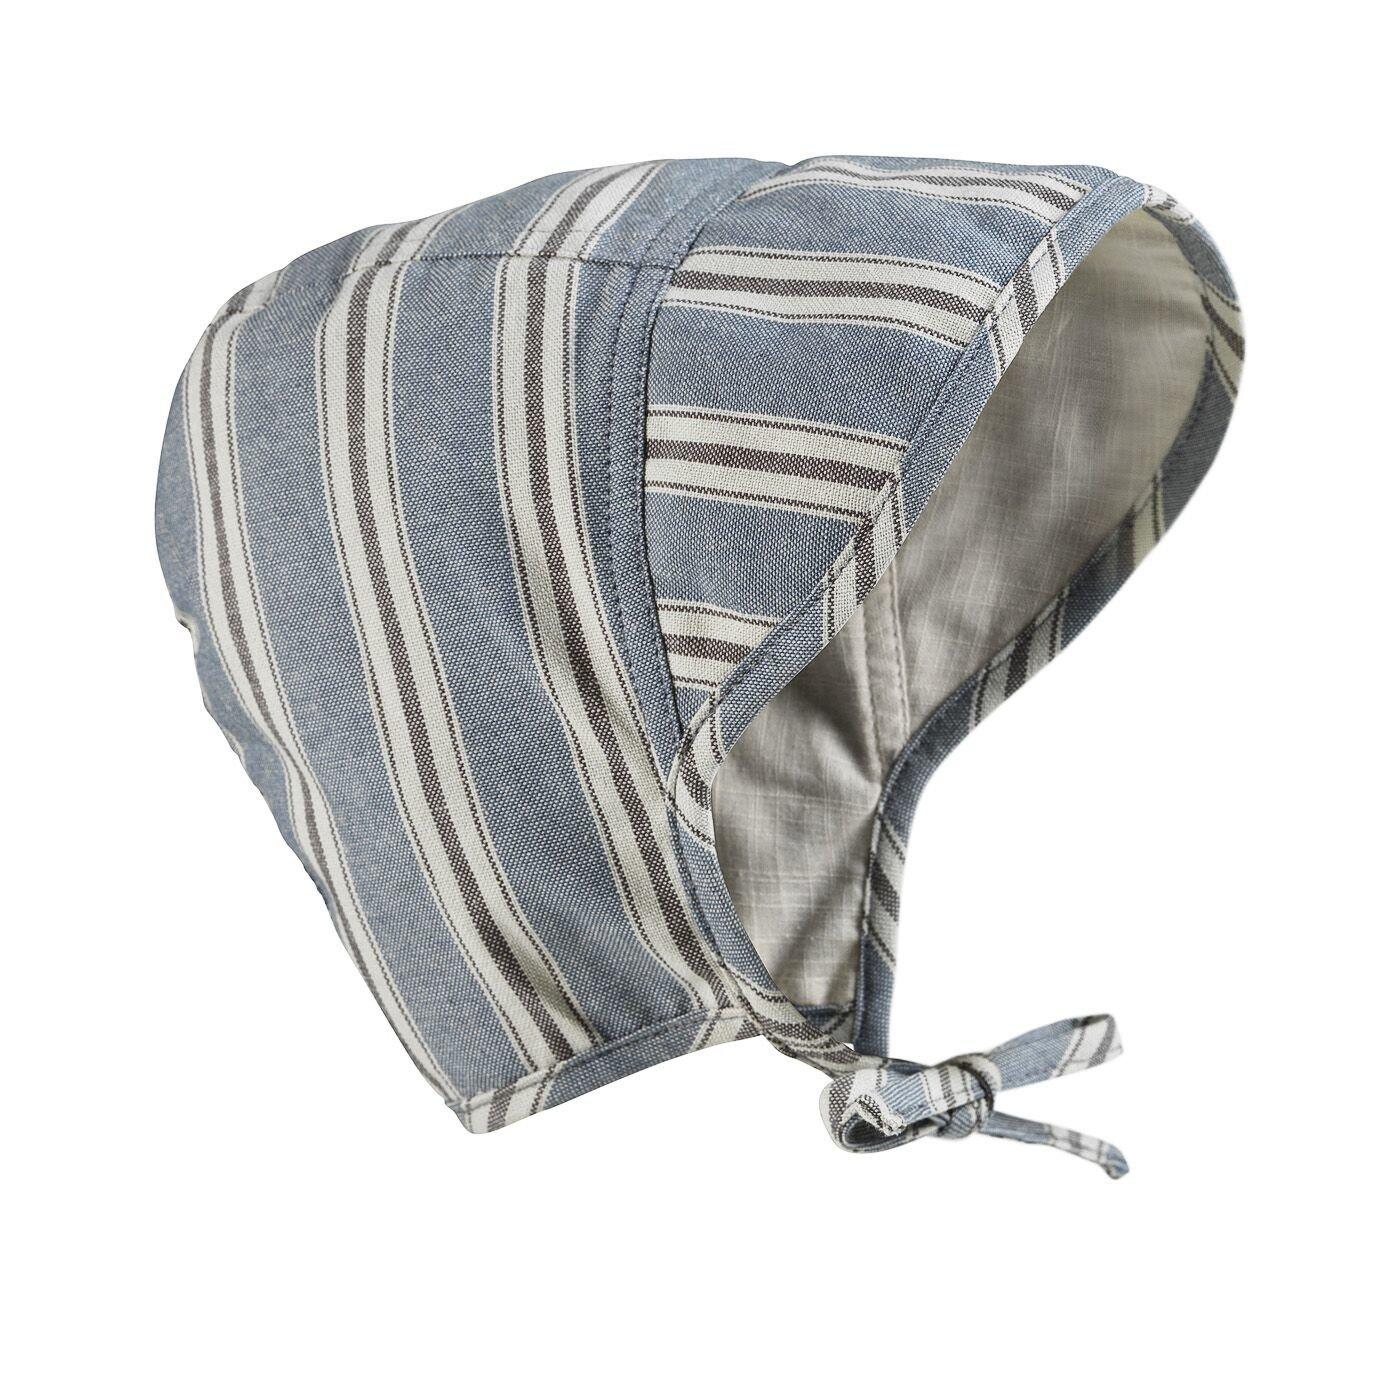 Elodie Details - Czapka Baby Bonnet - Sandy Stripe 0-3 m-ce